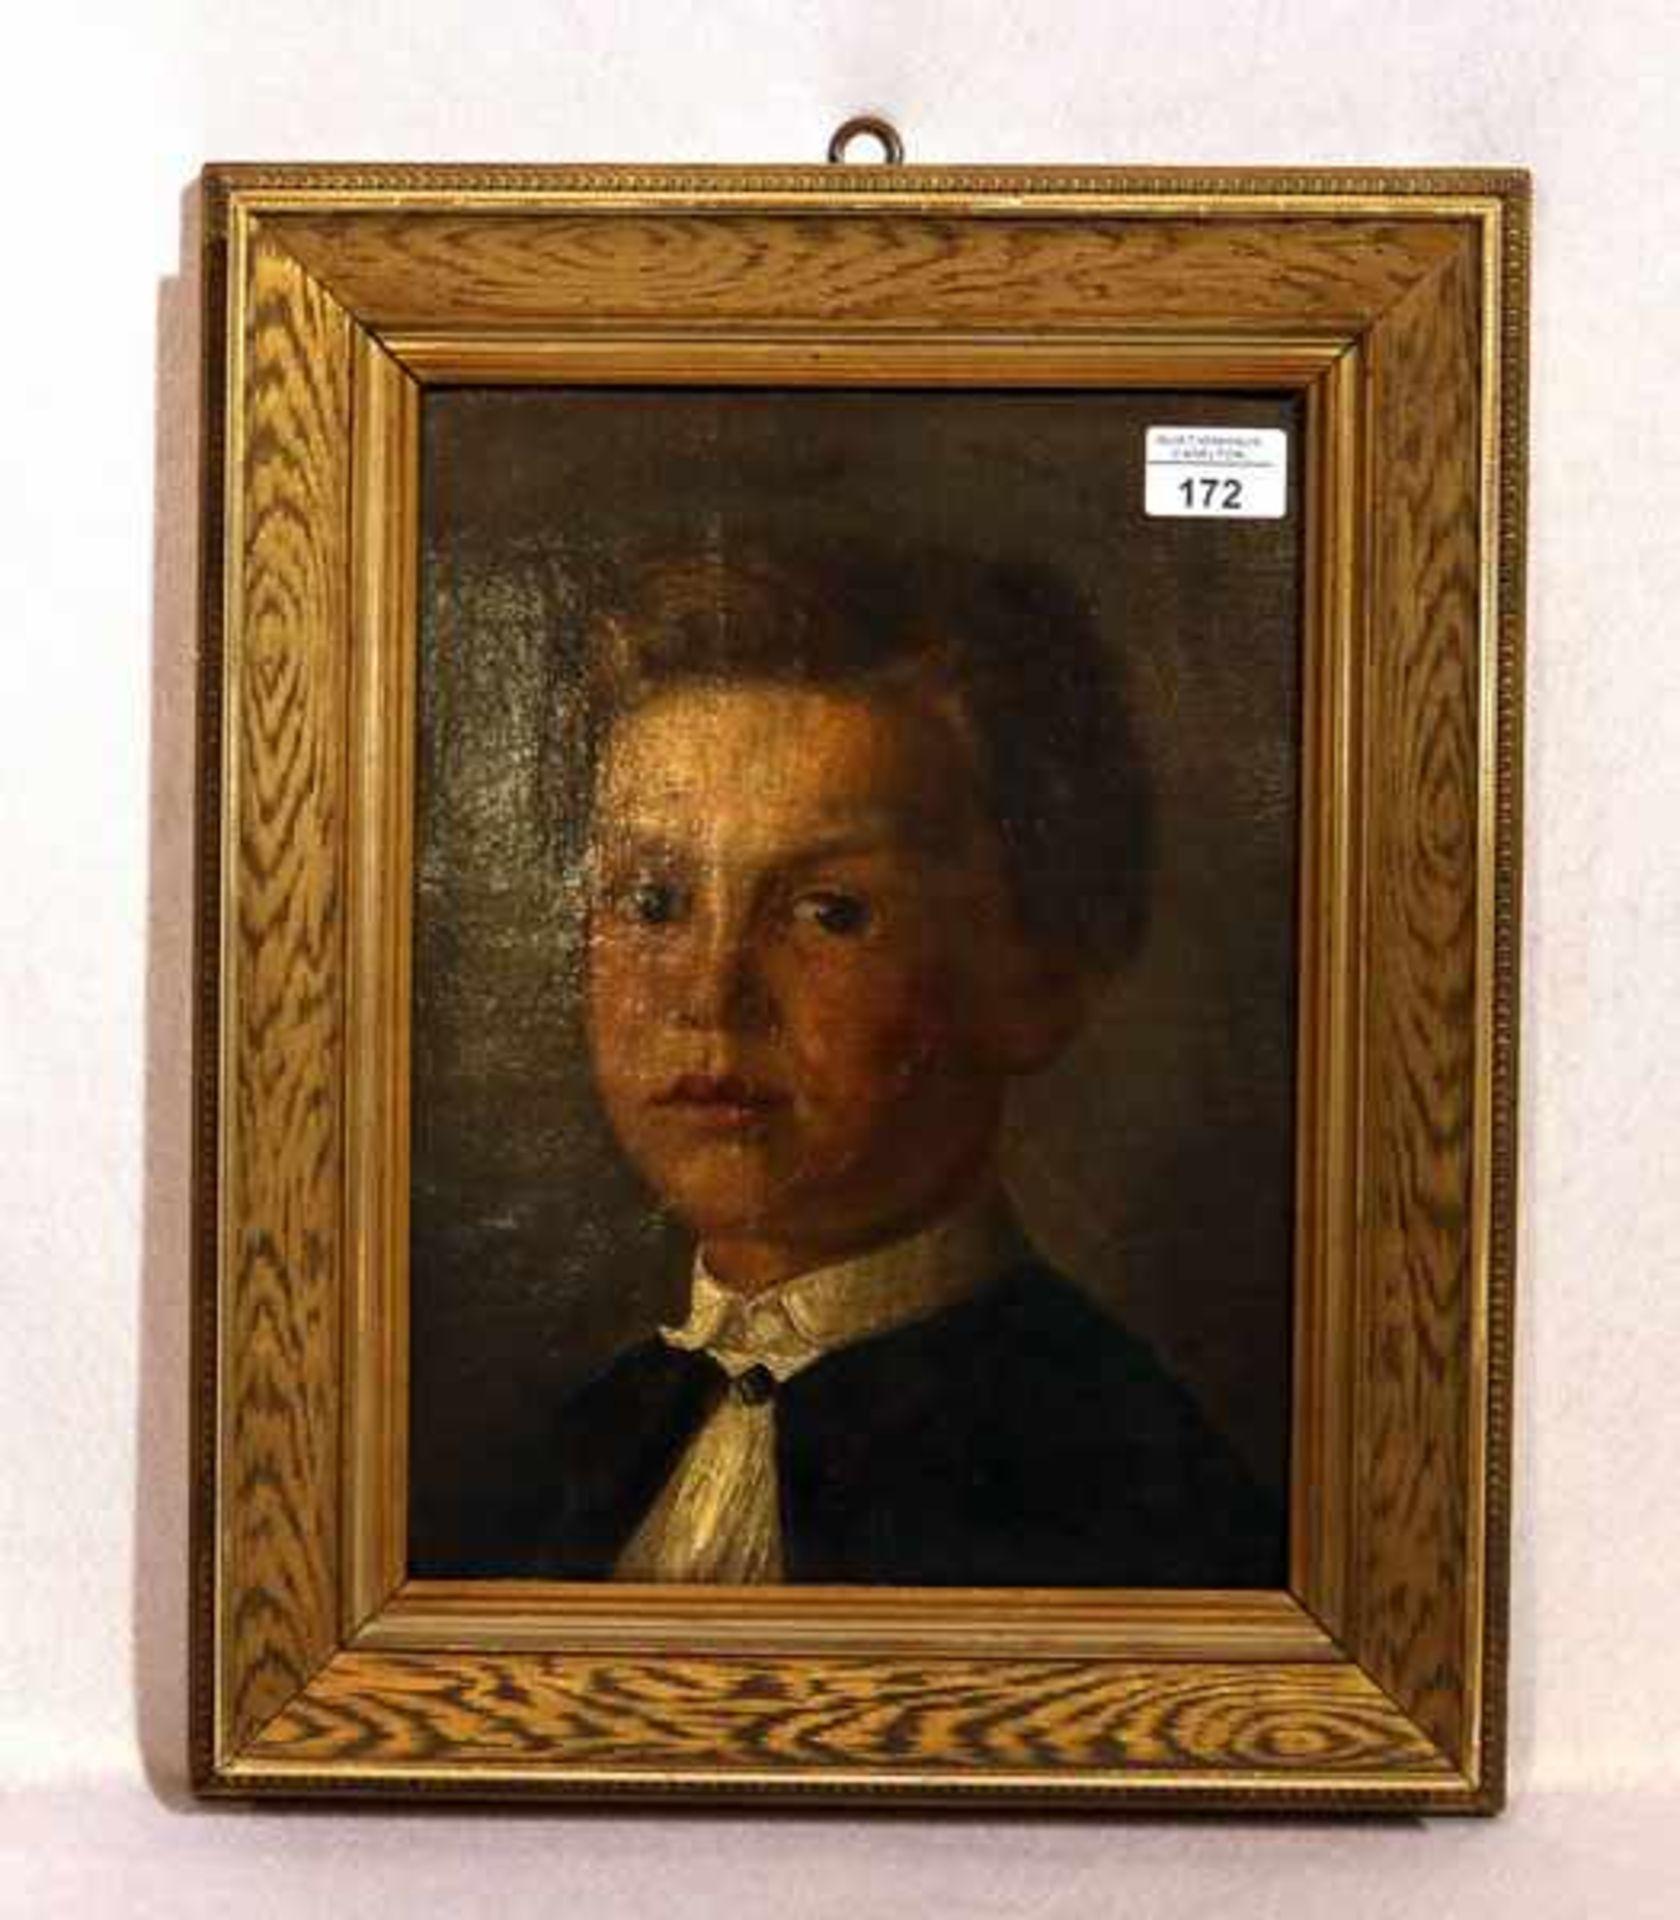 Los 172 - Gemälde ÖL/Malkarton 'Jungenbildnis', rückseitig beschrieben, gerahmt, Rahmen bestossen, incl.